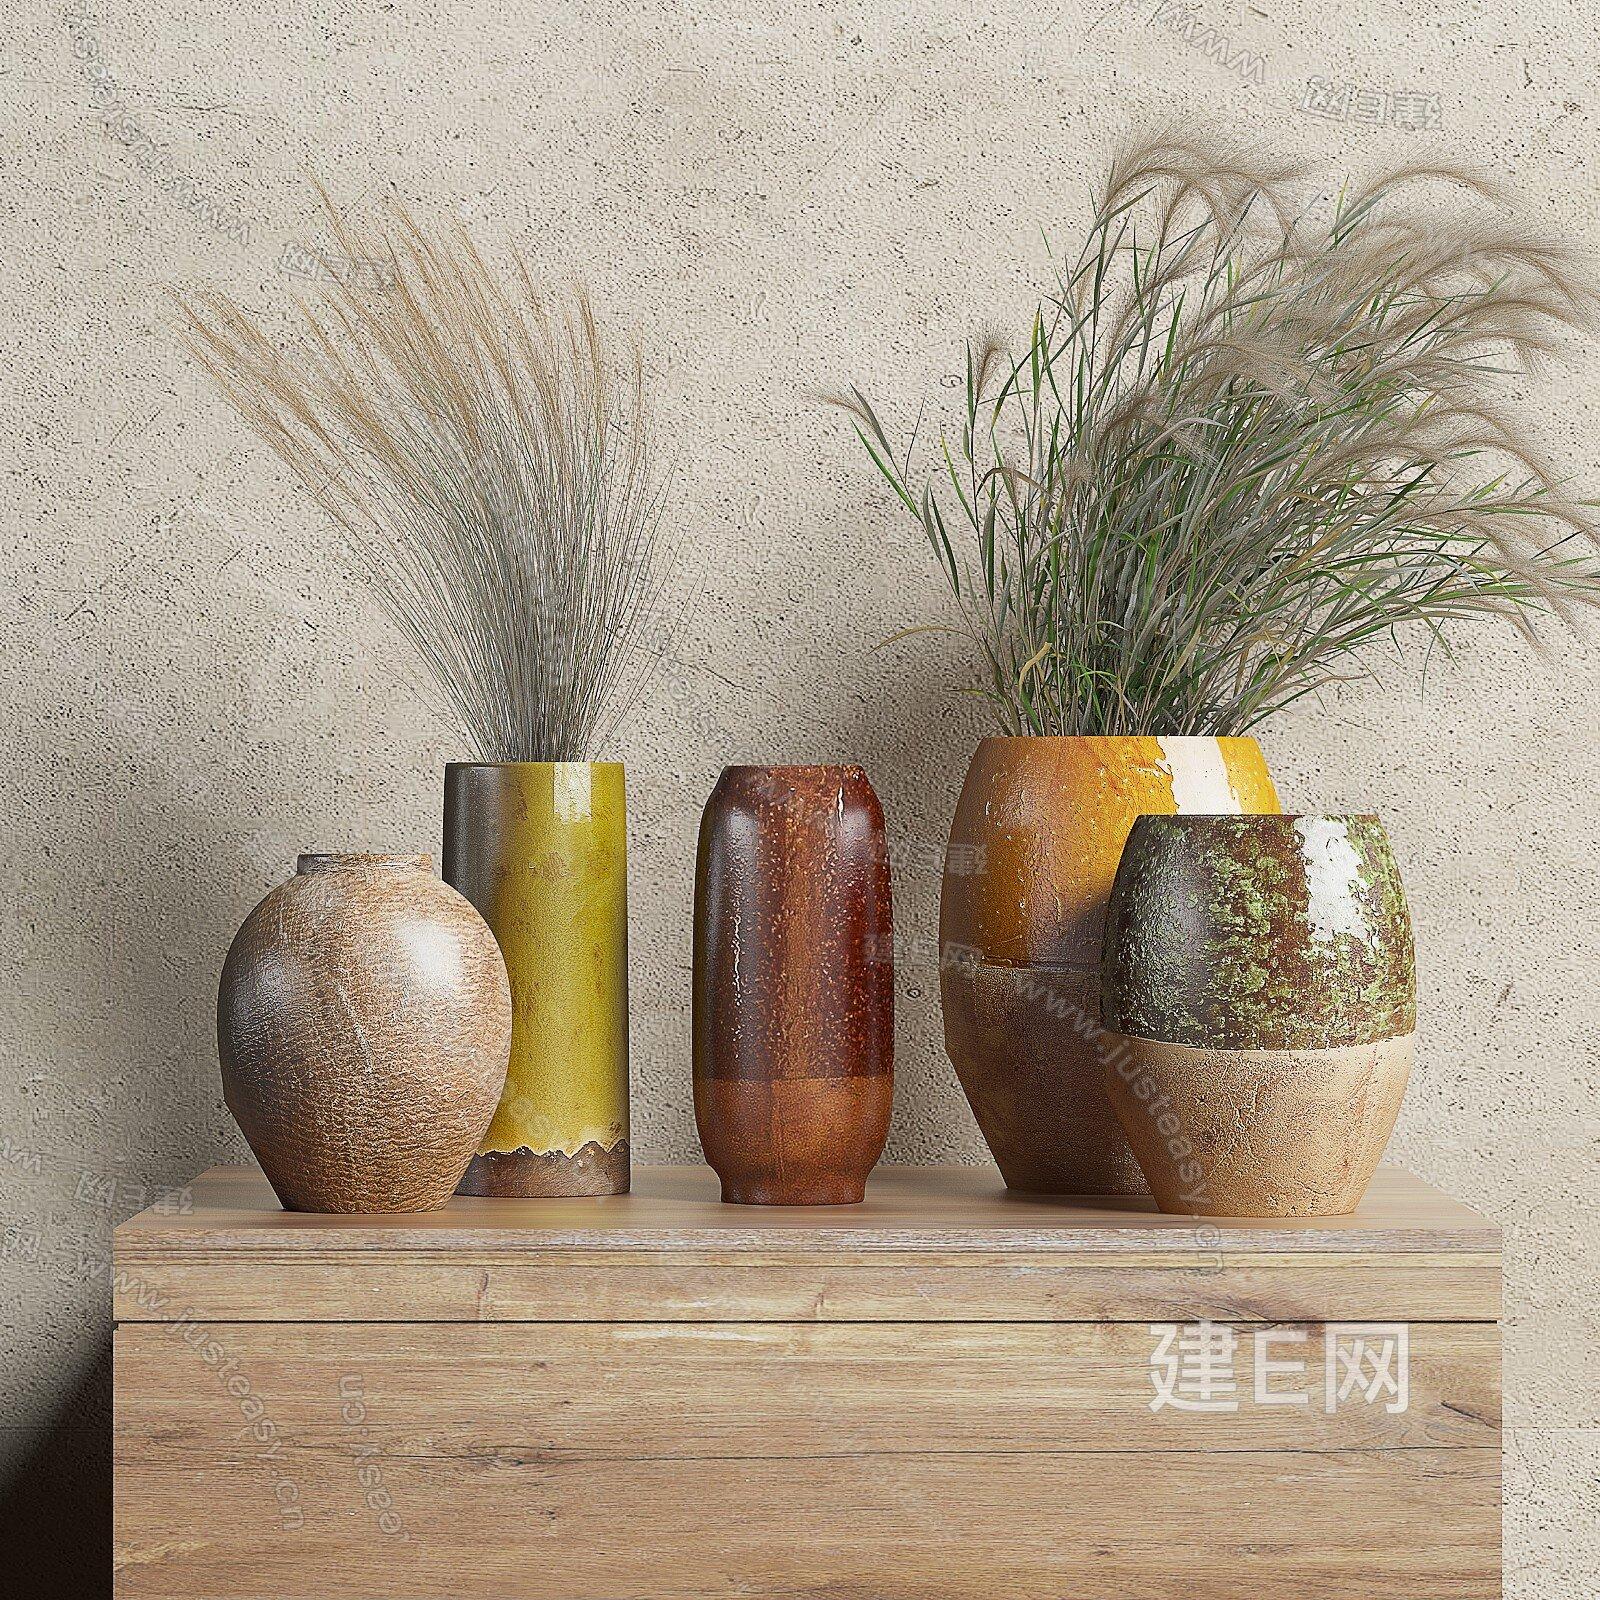 zara home 北欧陶瓷花瓶组合3d模型